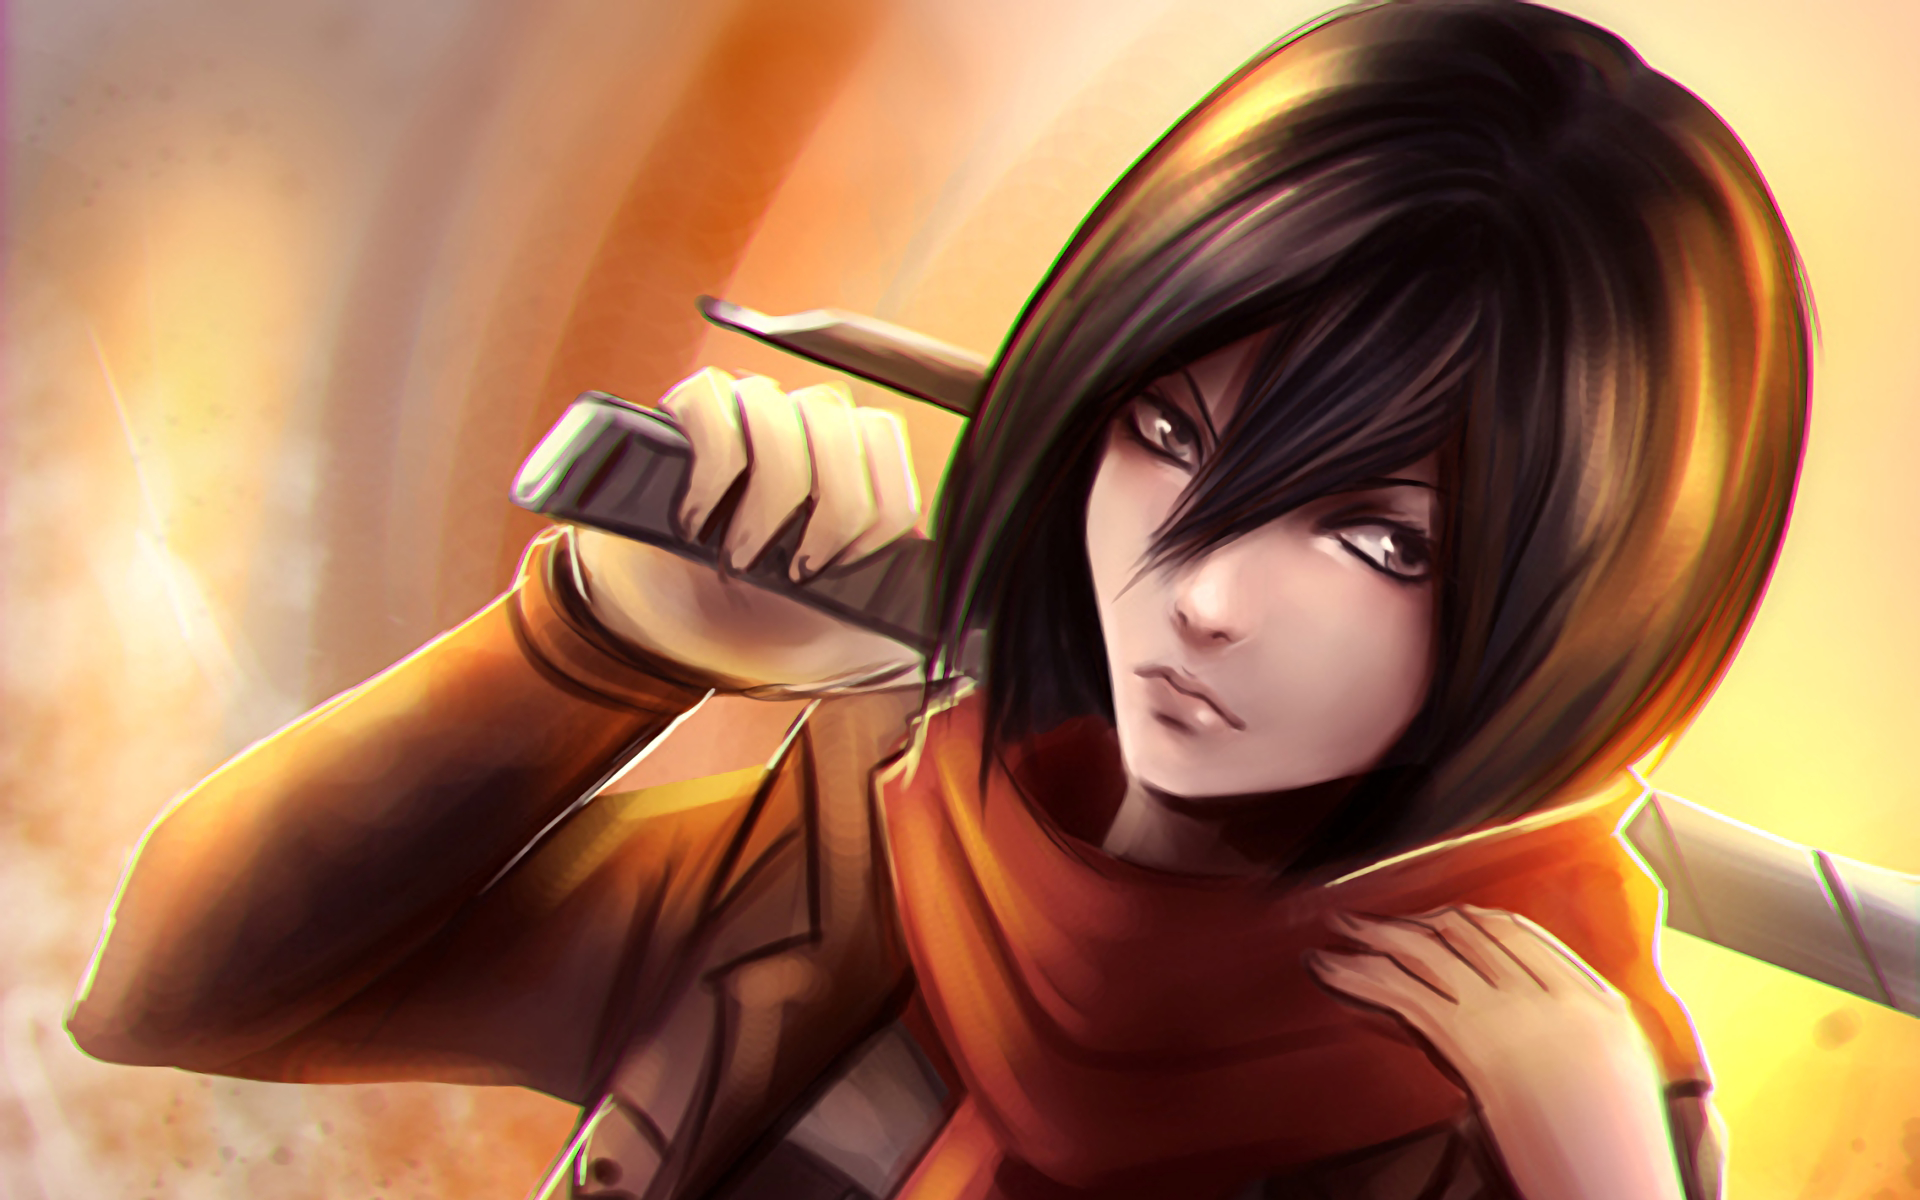 Anime Attack On Titan Shingeki No Kyojin Mikasa Ackerman